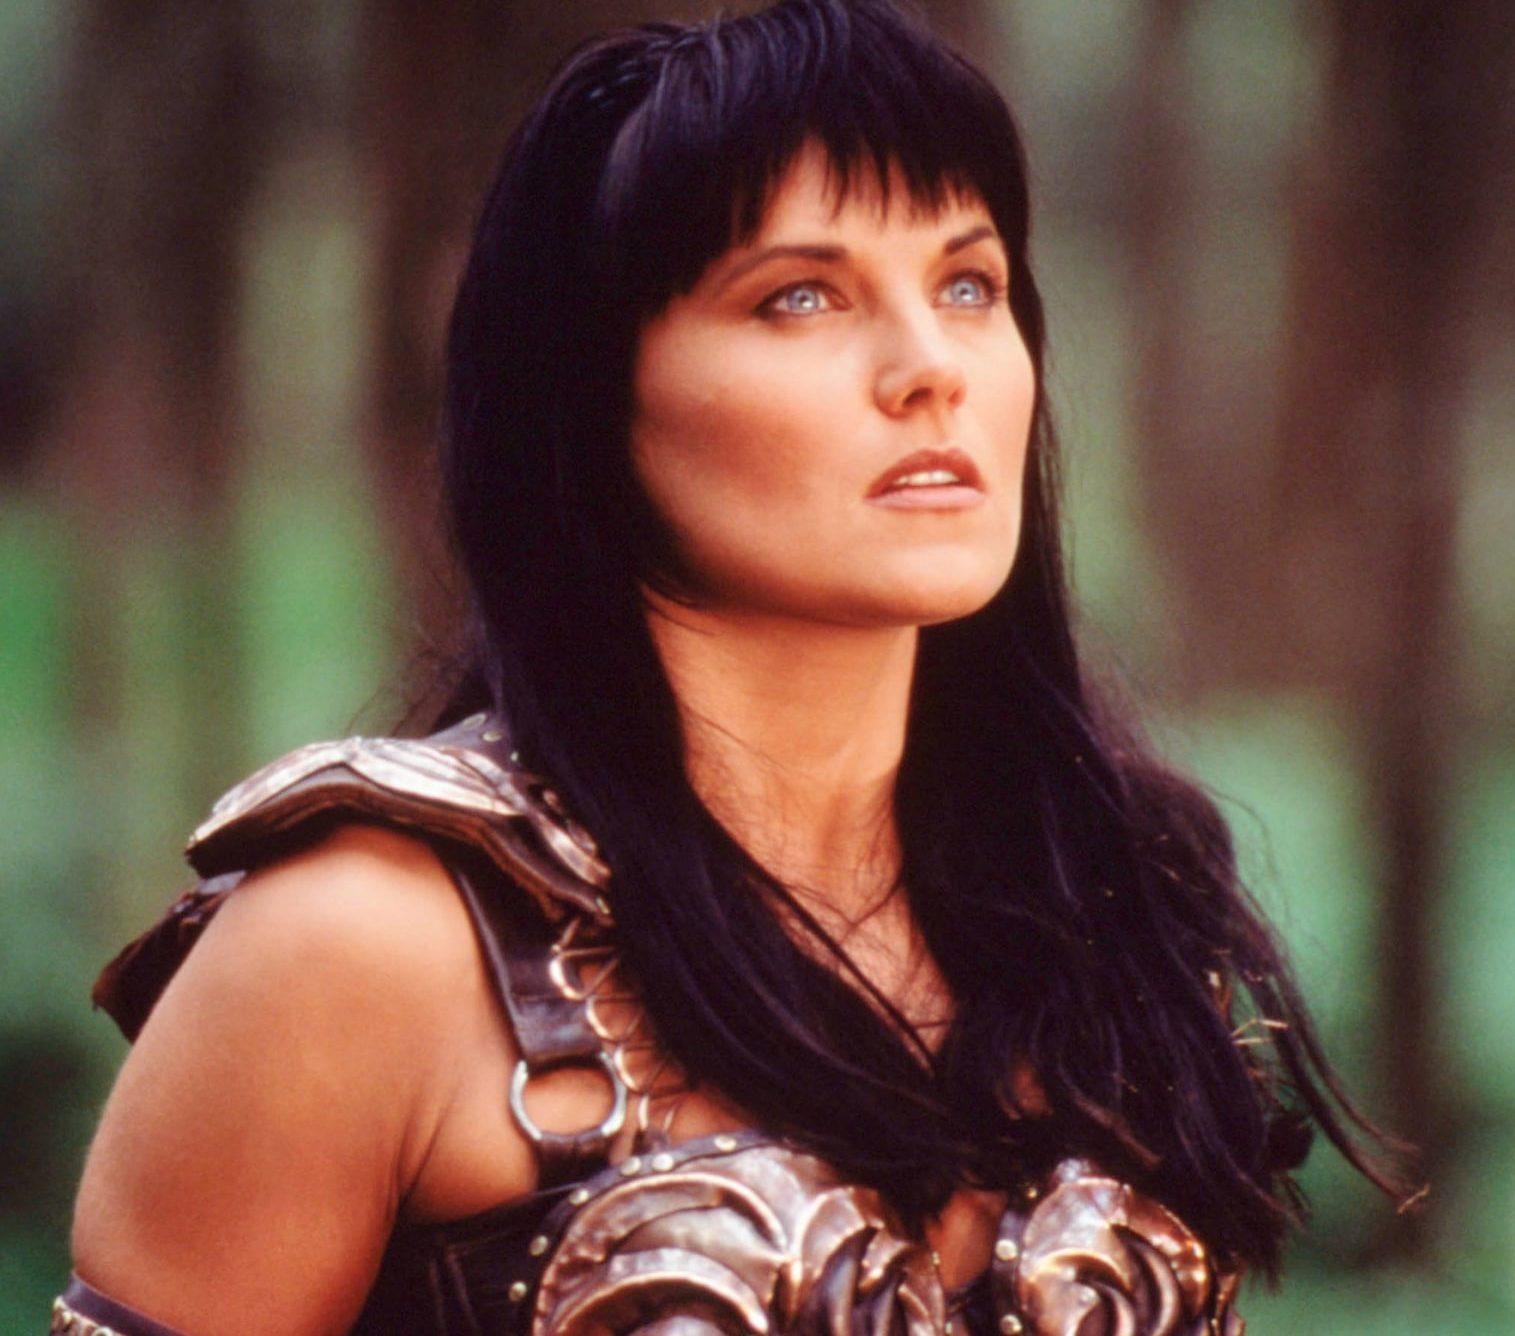 Xena Warrior Princess 1 e1610101455369 20 Things You Never Knew About Xena: Warrior Princess